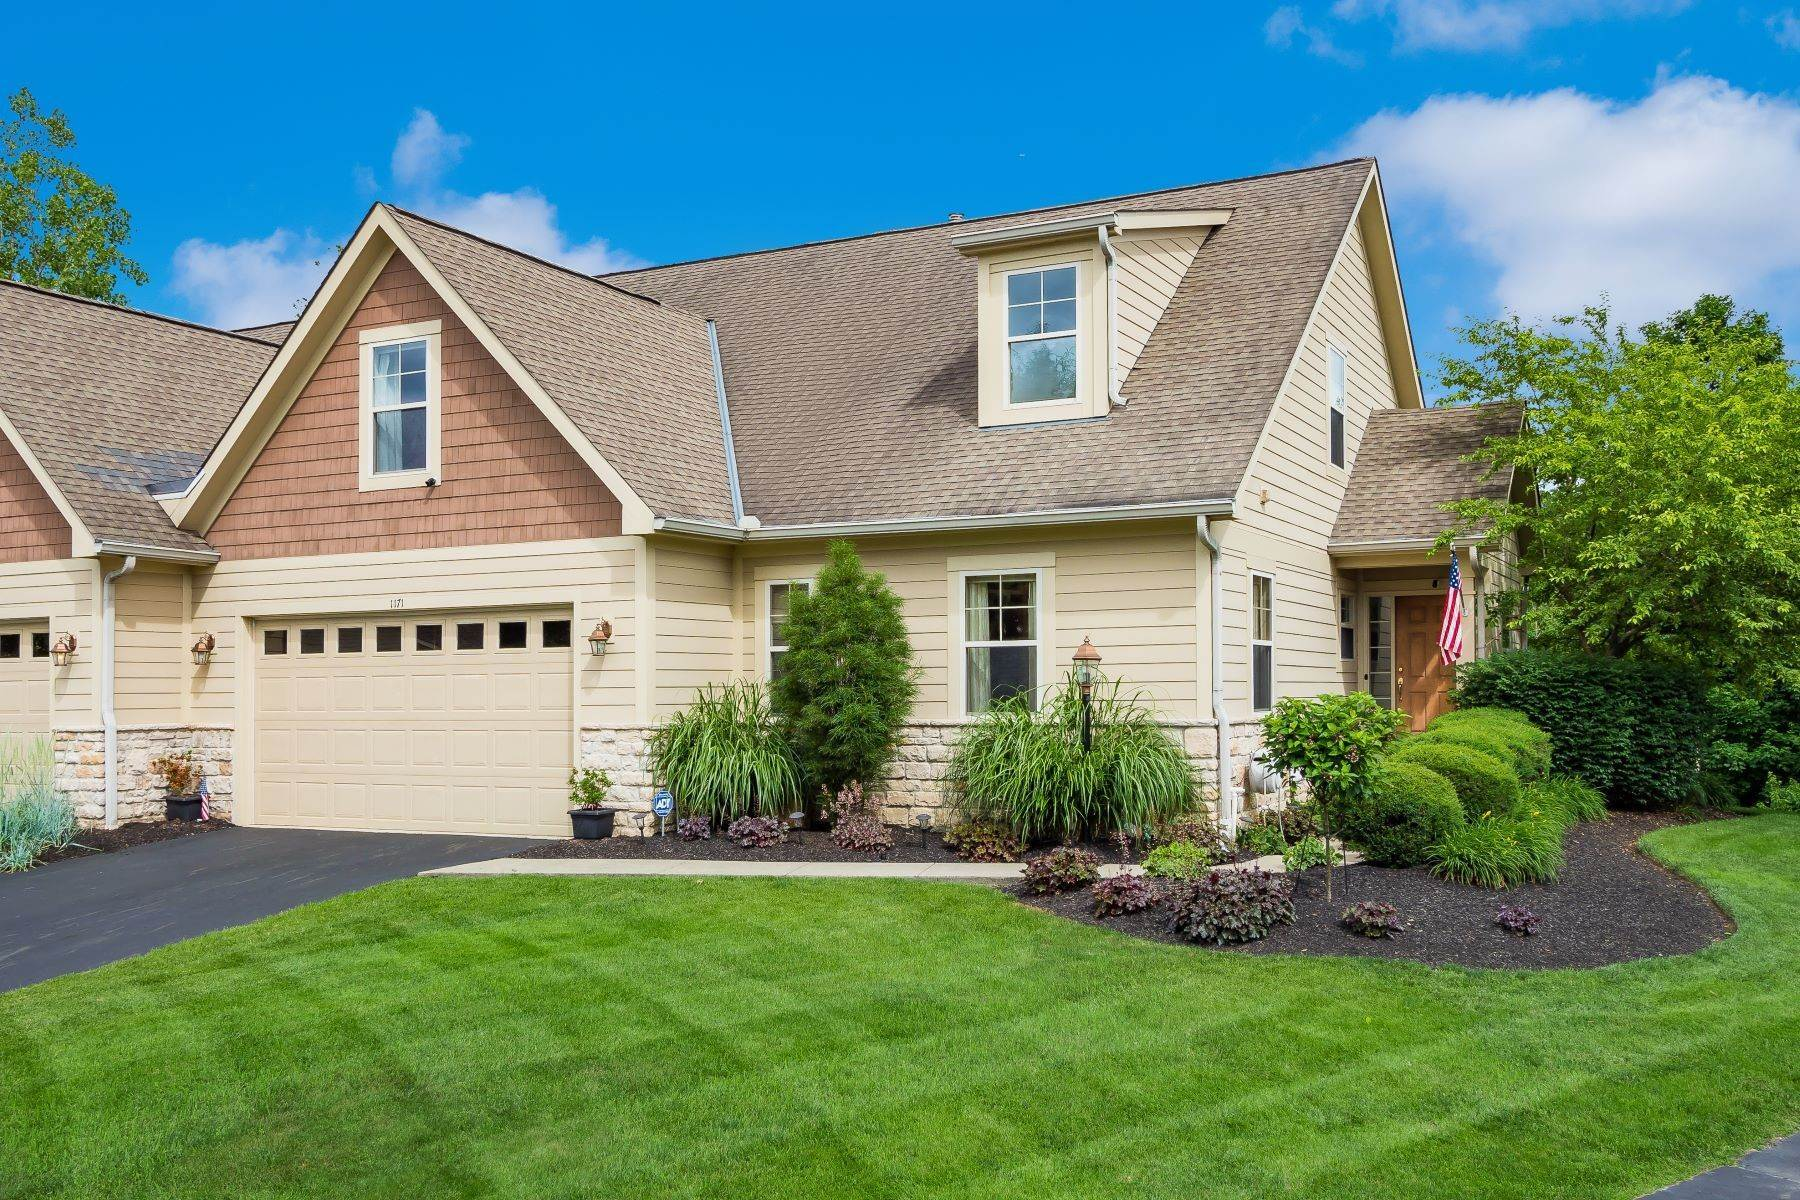 Condominiums for Sale at 1171 Cross Creeks Ridge Pickerington, Ohio 43147 United States